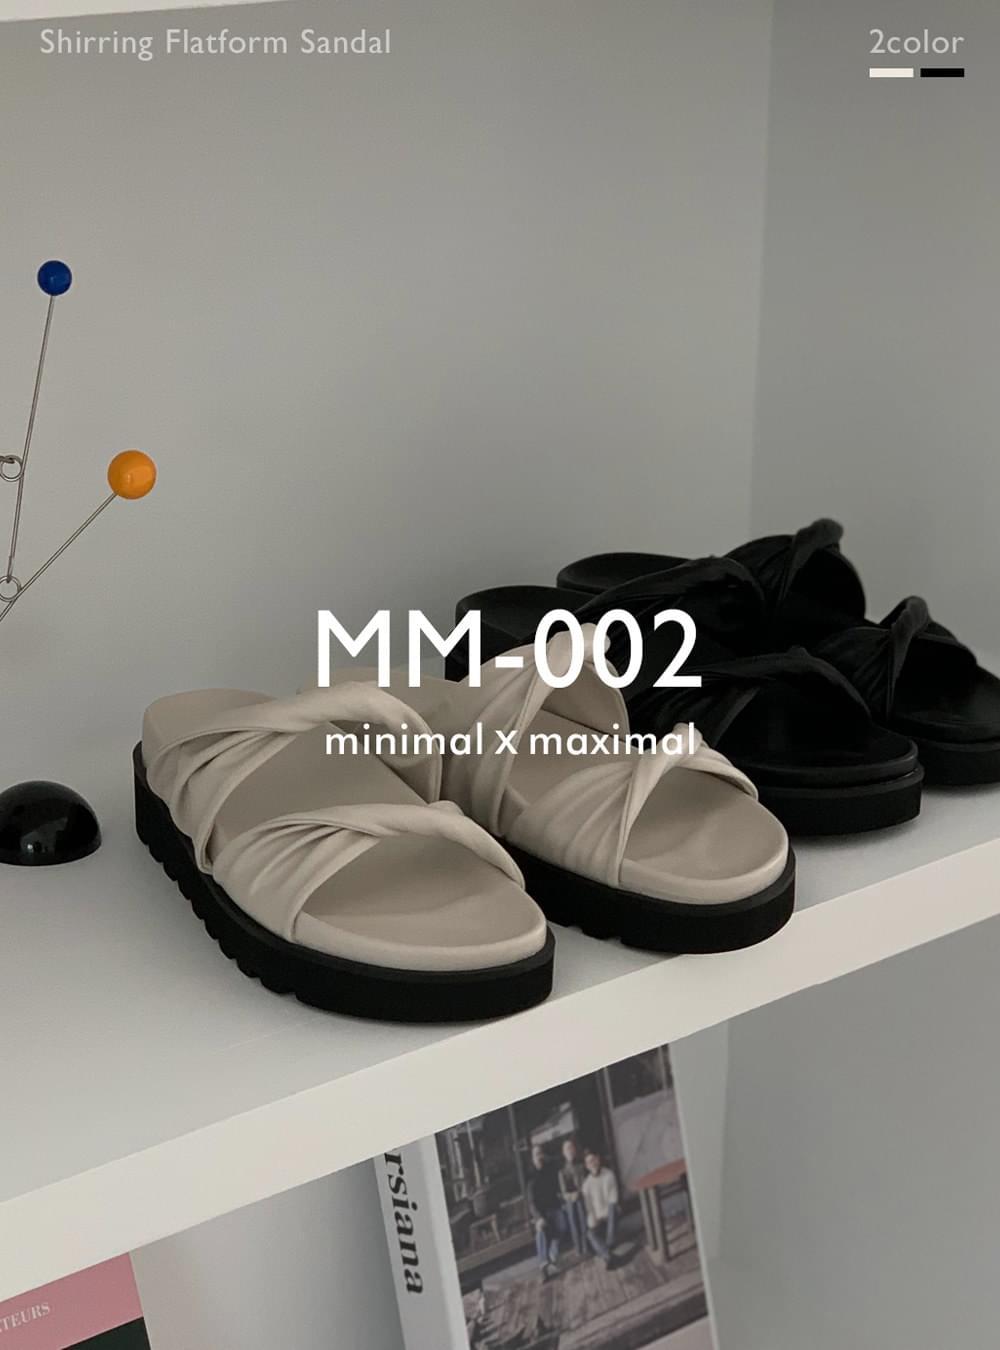 MMMM# Exclusive Order/Same Day Shipping MM-002 Shirring Platform Sandals